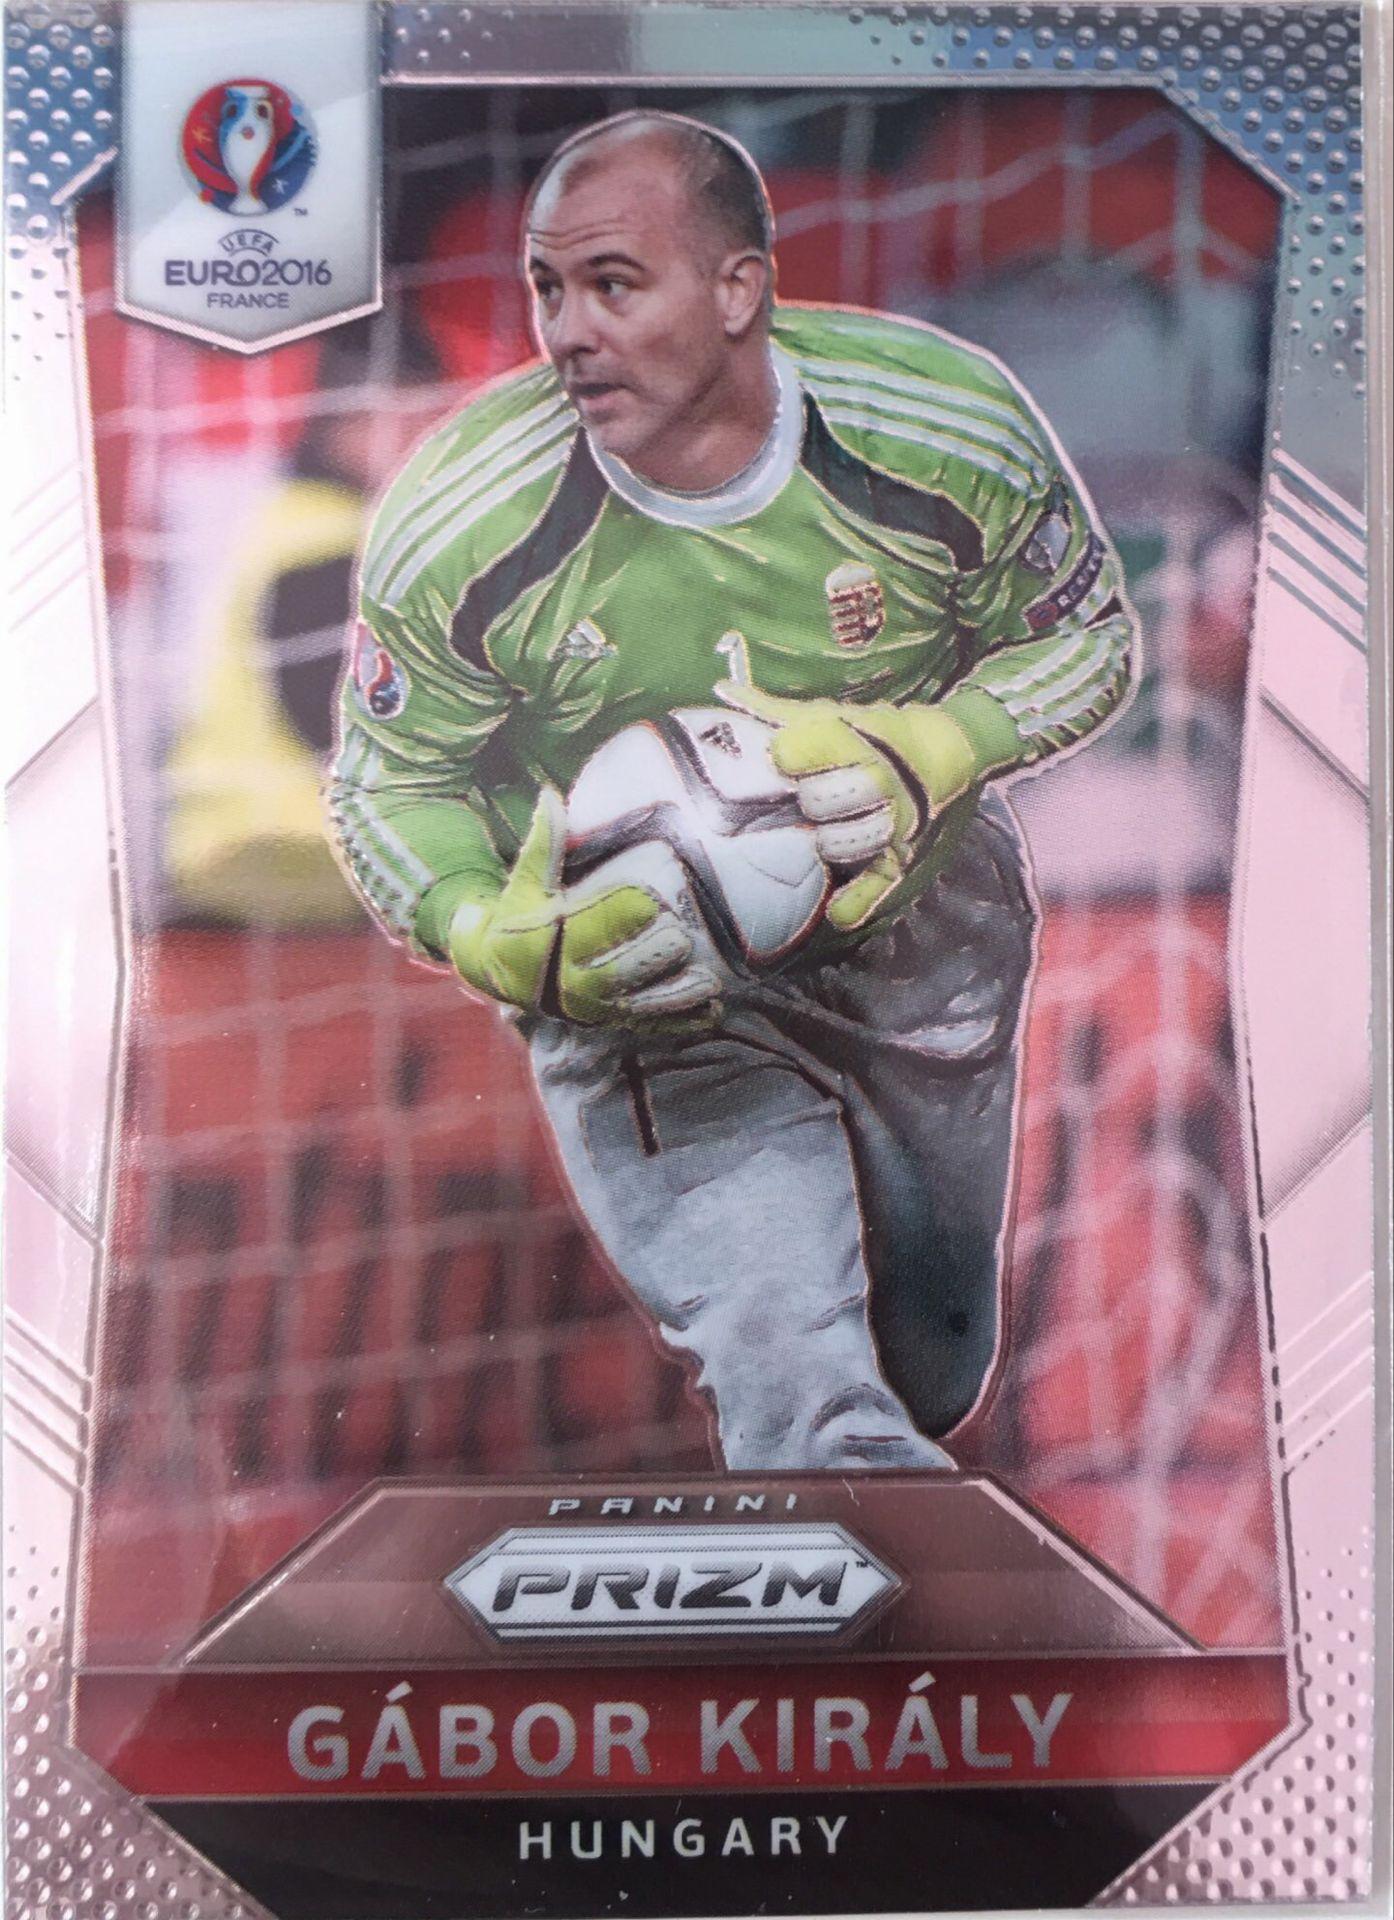 【Ed】2016Panini帕尼尼欧洲杯足球球星卡Gabor Kiraly基拉利匈牙利NO.236普卡